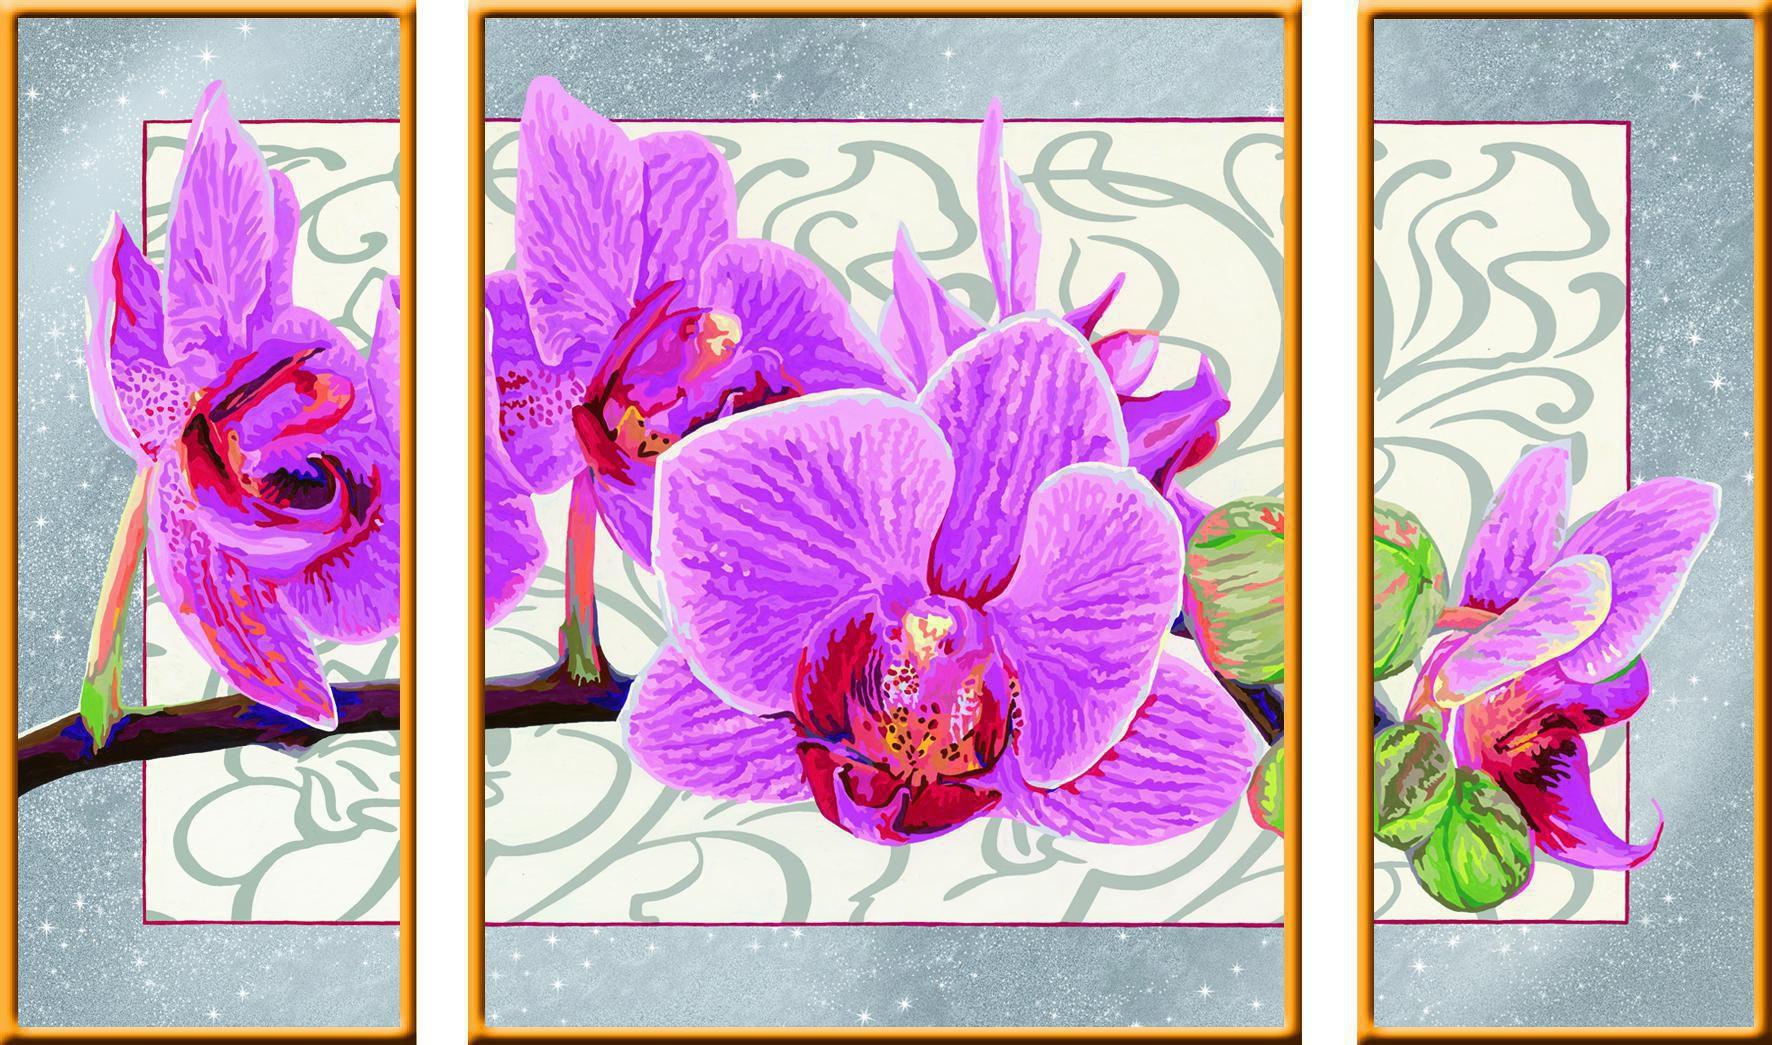 ravensburger malen nach zahlen wilde orchidee ravensburger hobbyshop. Black Bedroom Furniture Sets. Home Design Ideas